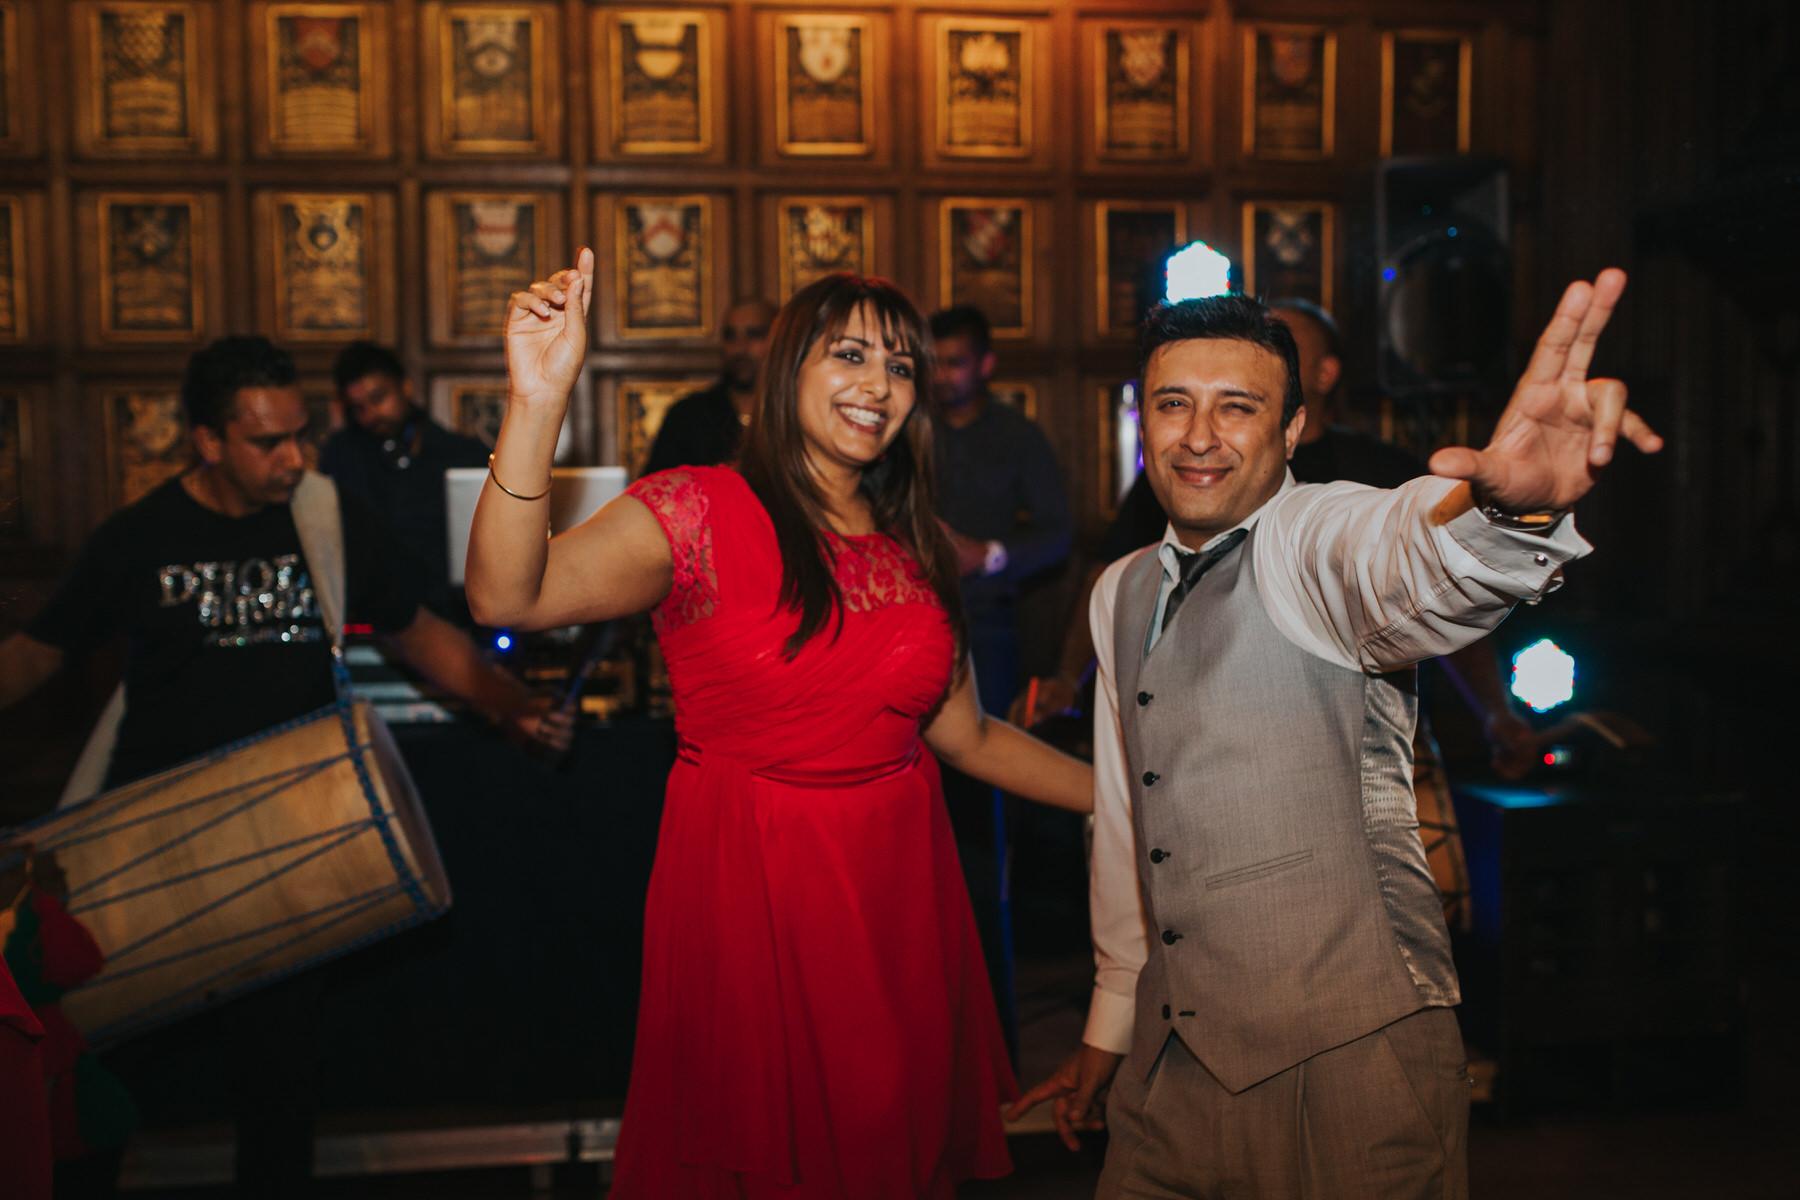 240-Anglo-Asian-London-Wedding-guests-dancing.jpg